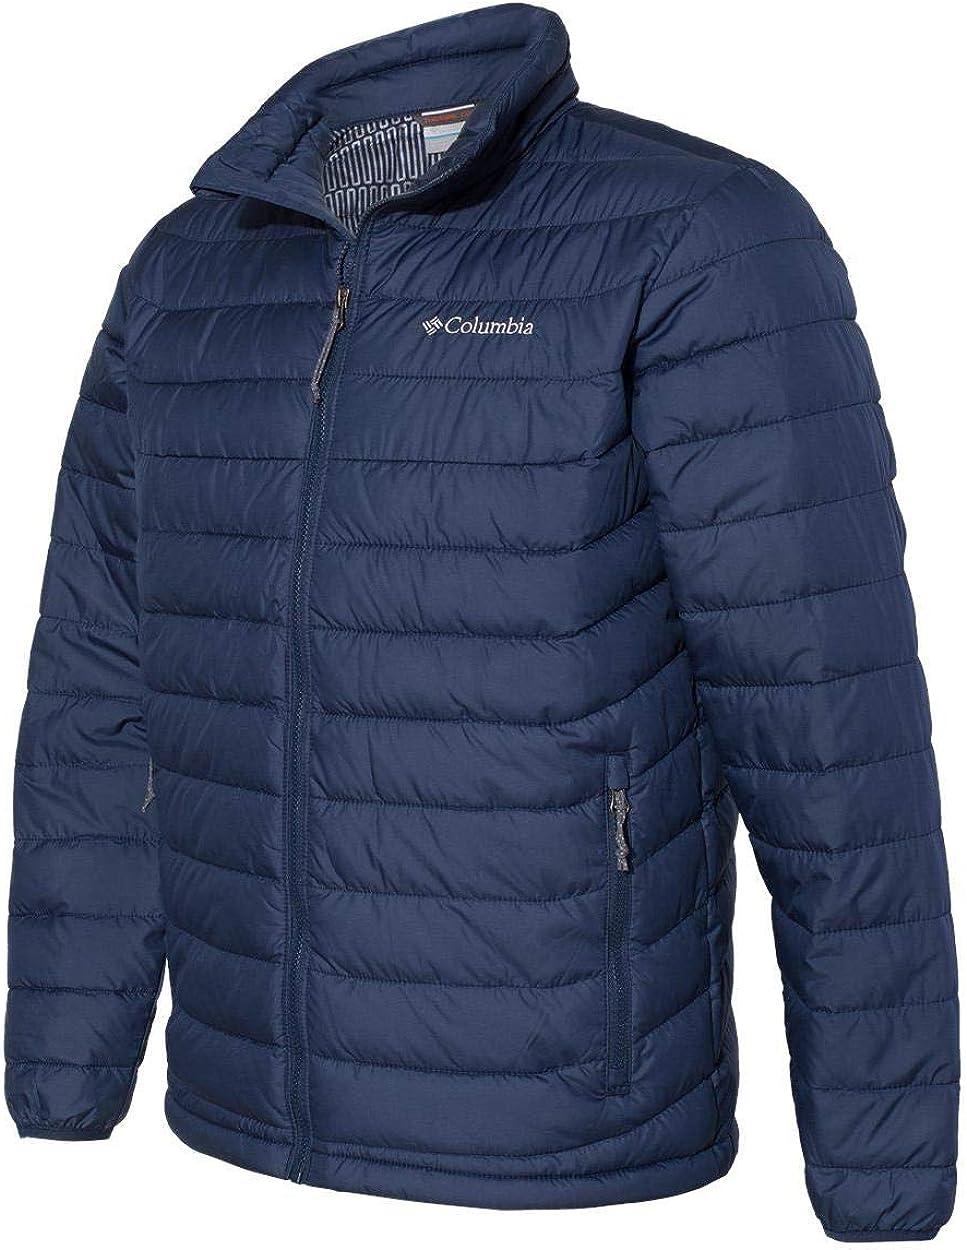 safety Columbia - Oyanta Trail Jacket 173680 Columbus Mall Puffer